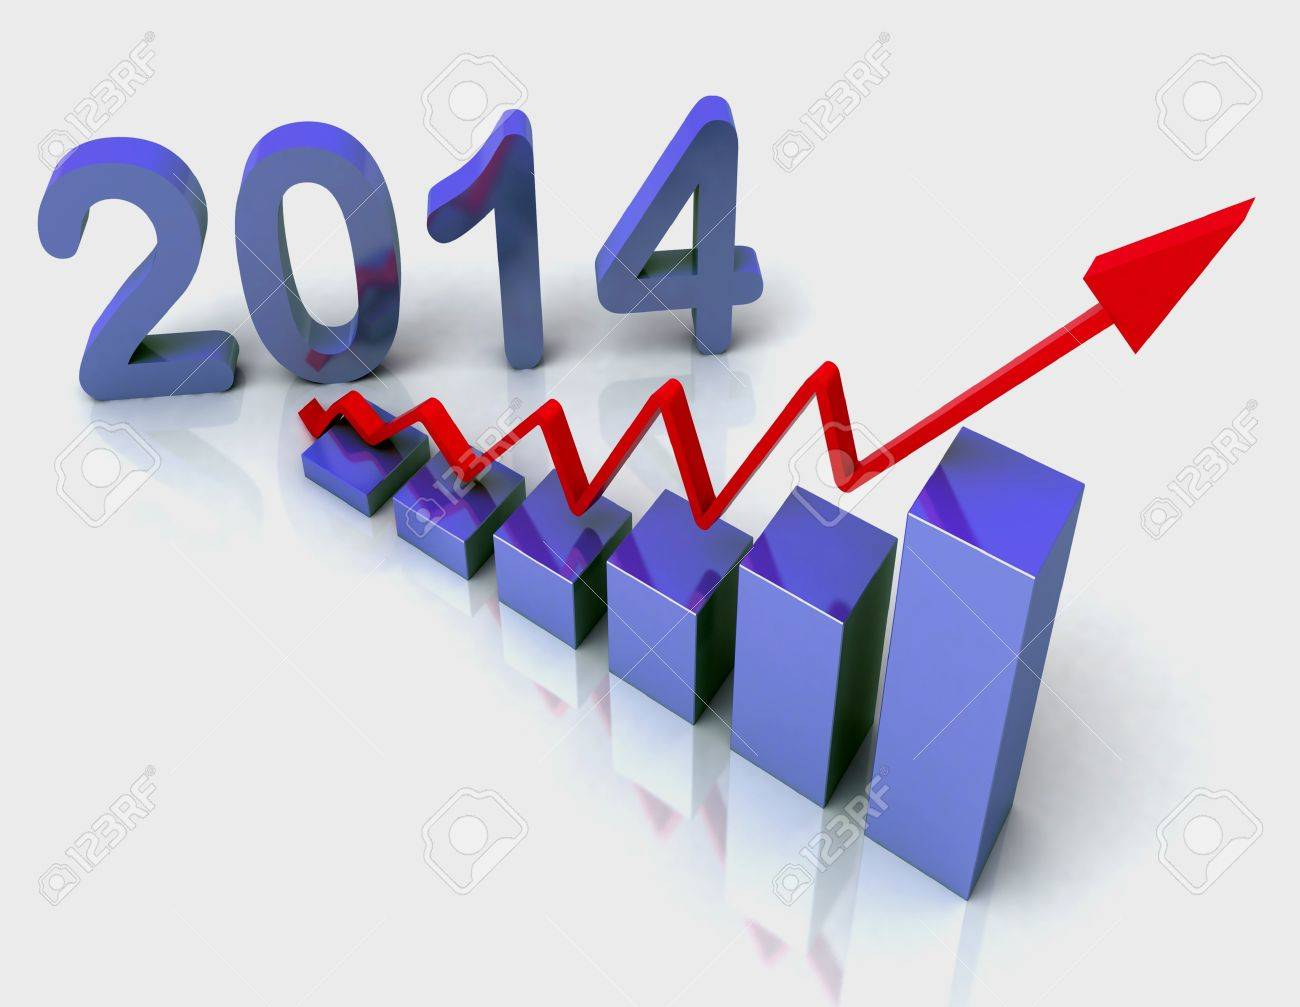 2014 Blue Bar Chart Showing Budget Versus Actual Stock Photo - 16517767